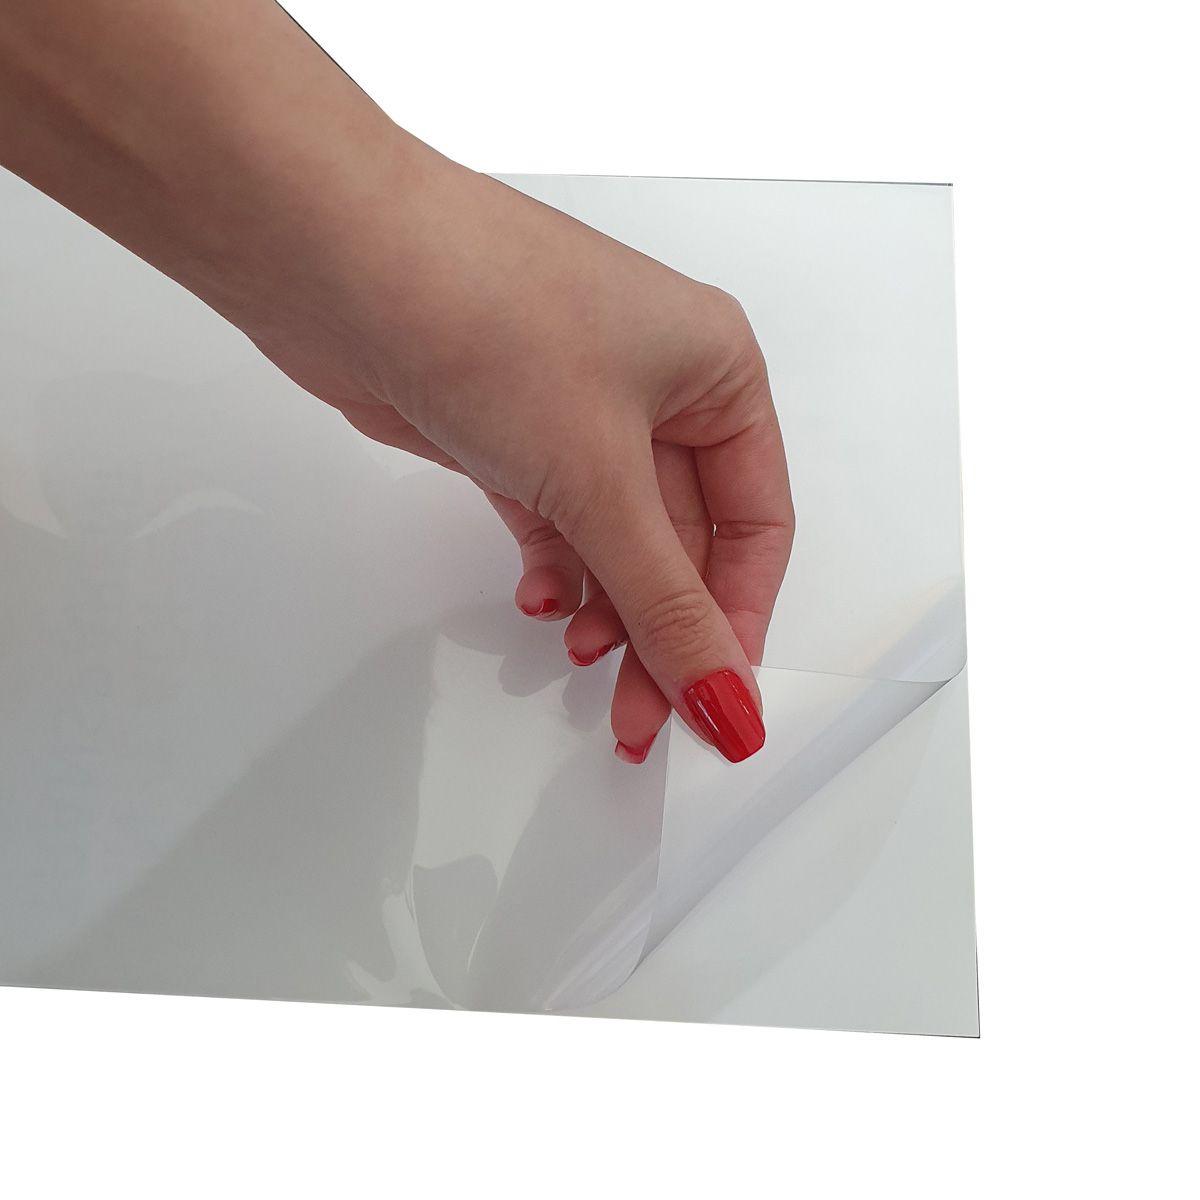 100 Folhas Papel Adesivo Vinil Branco para Jato de Tinta Inkjet 135g 20fls Evolut